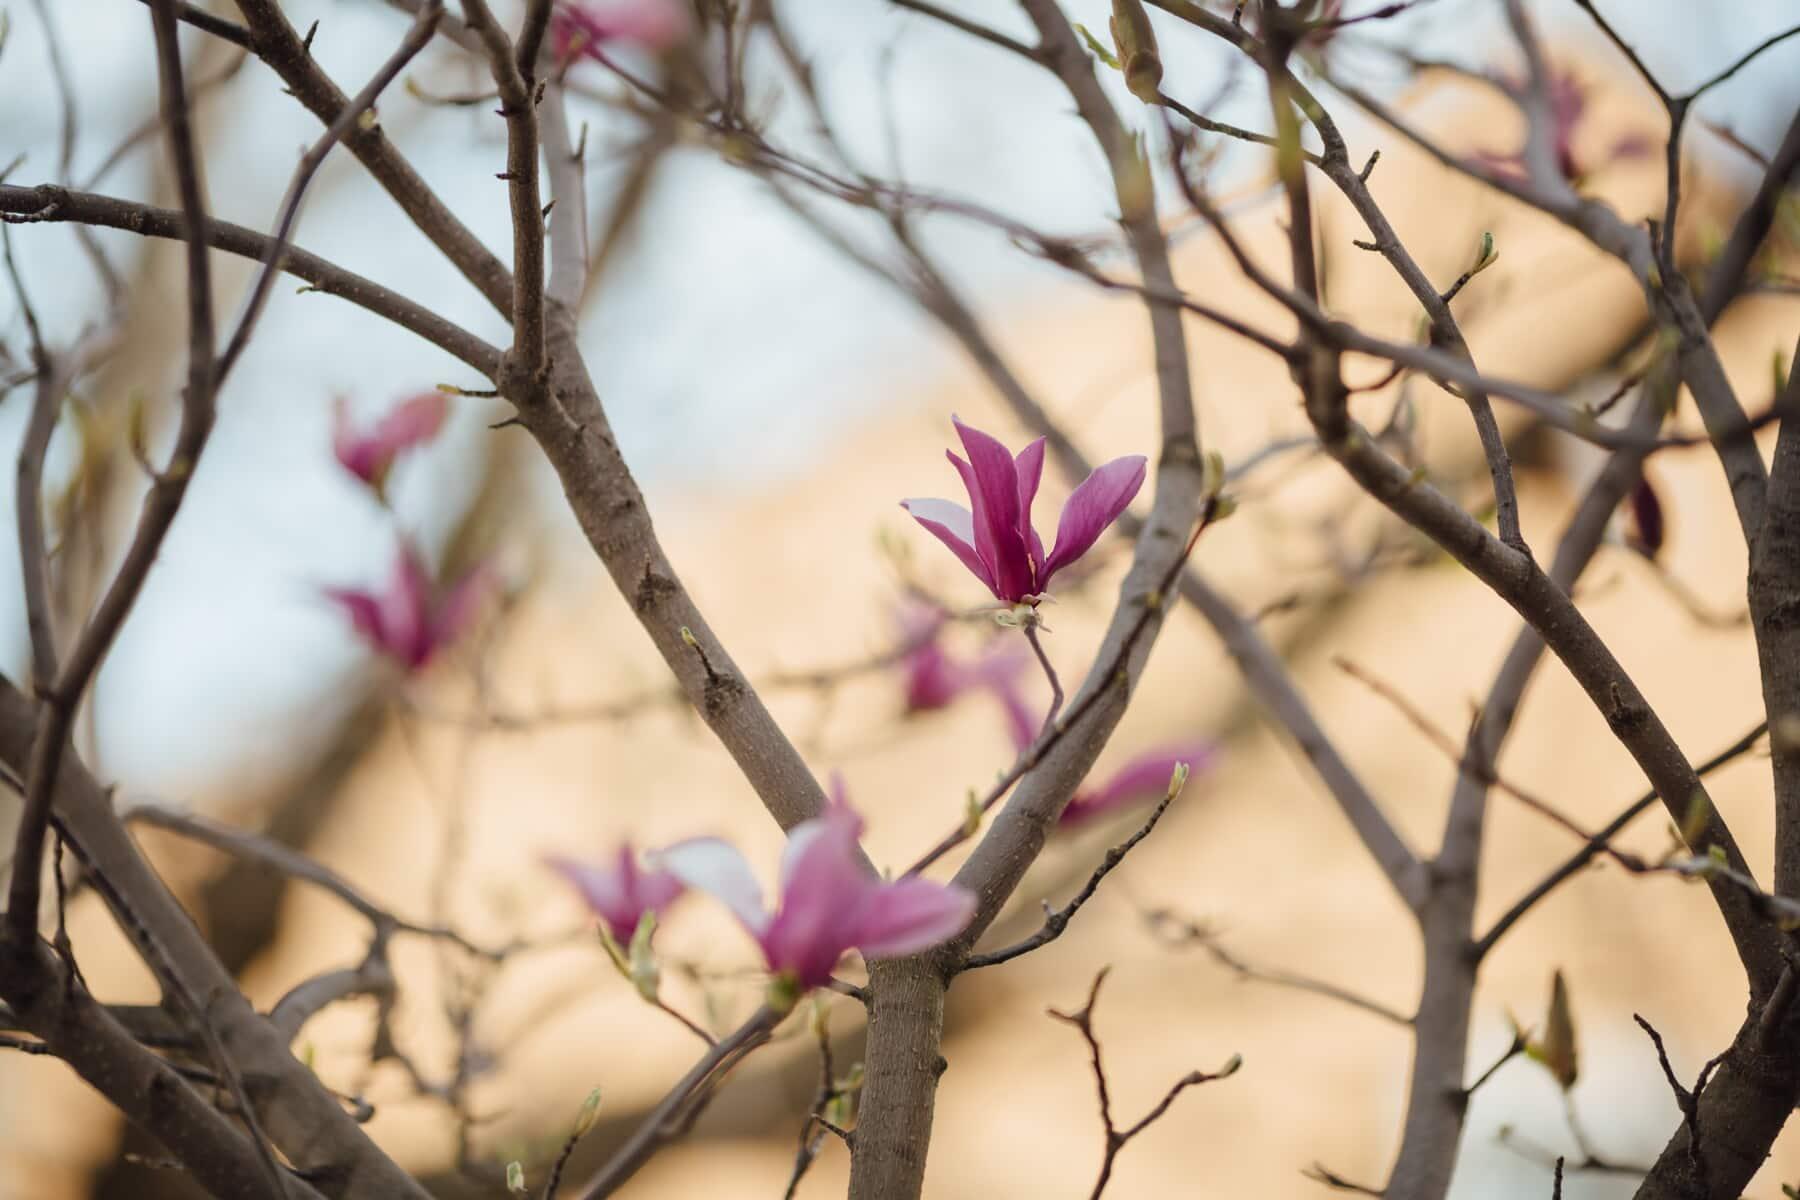 Blüte, Magnolie, Geäst, Bäume, Natur, Blume, Struktur, Ast, im freien, Flora